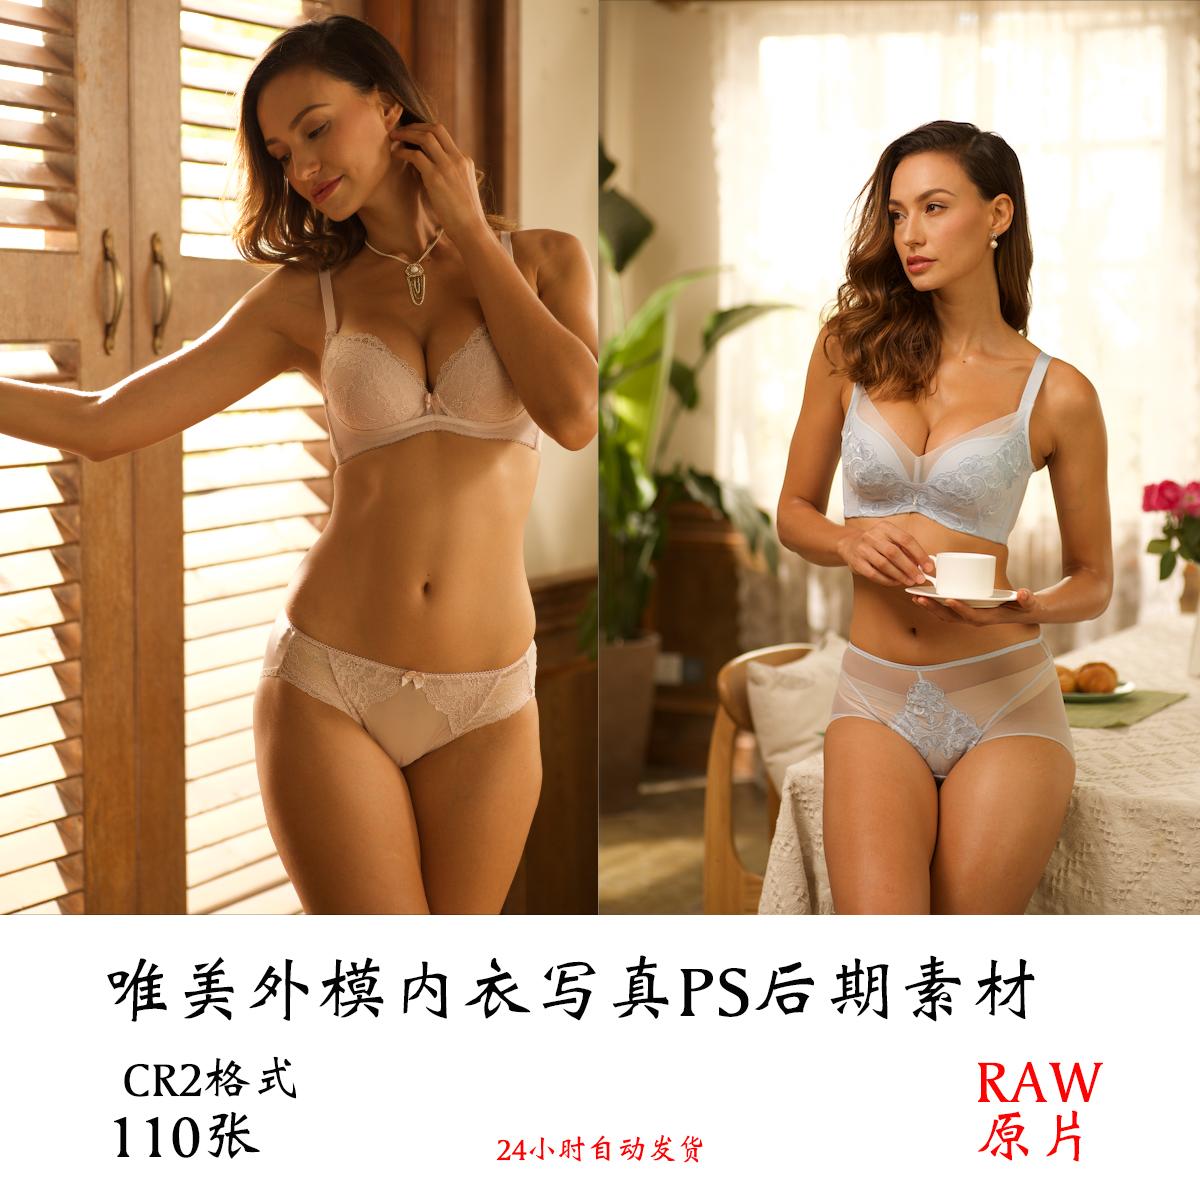 【M65】外模广告内衣写真RAW原图PS修图练习调色素材